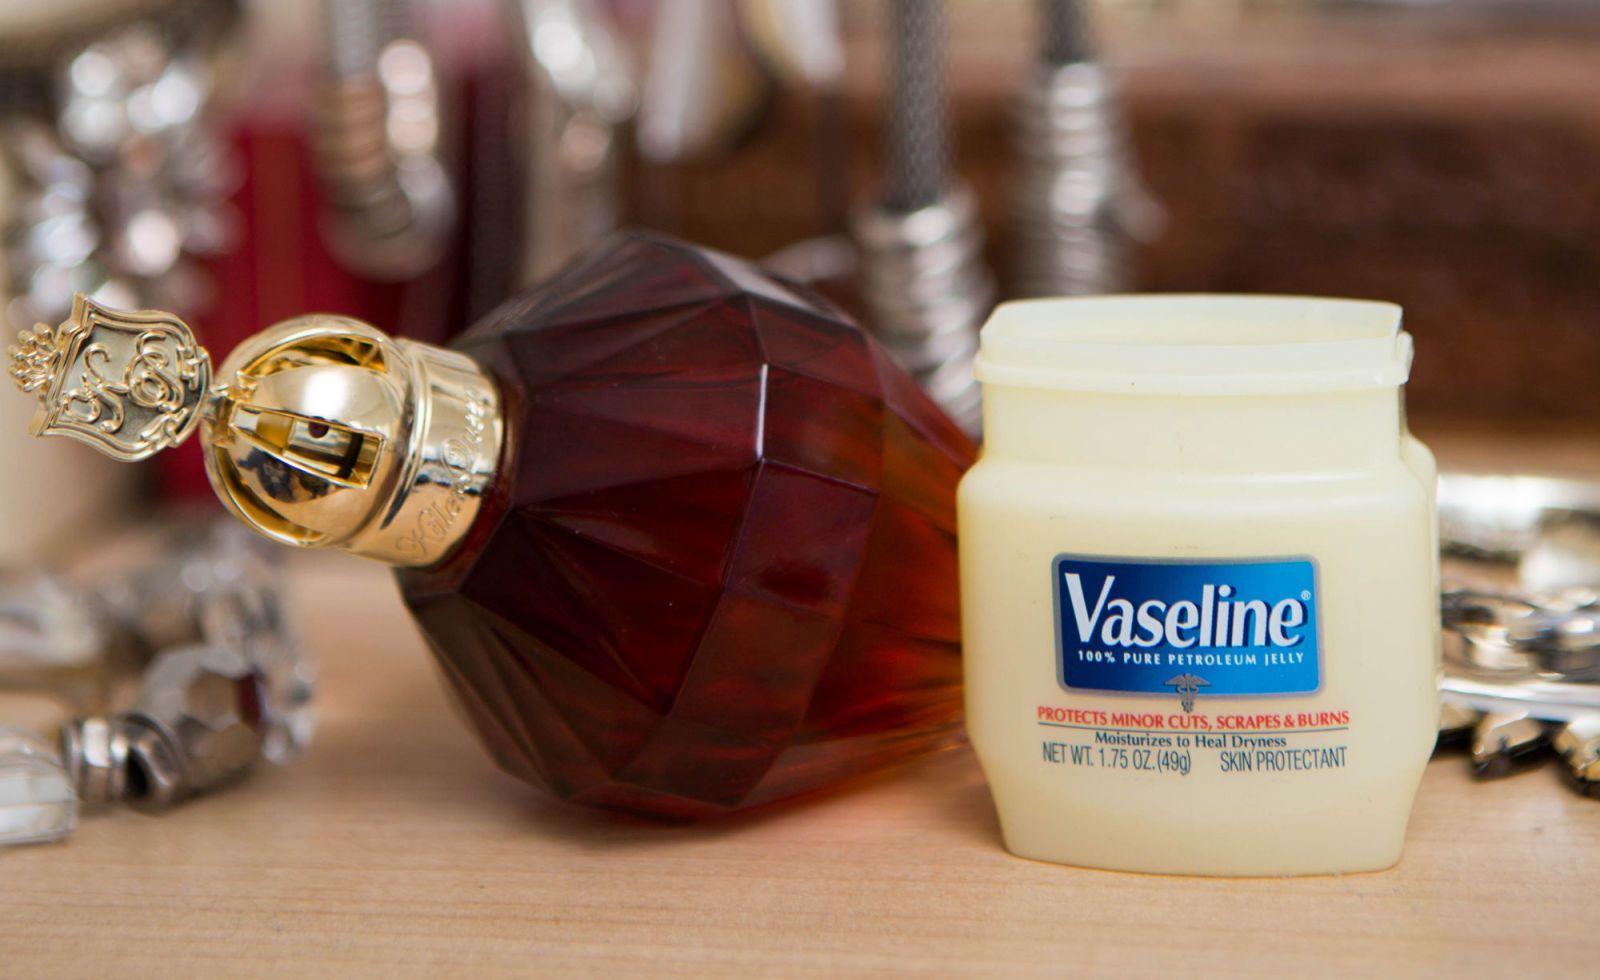 Parfum et vaseline